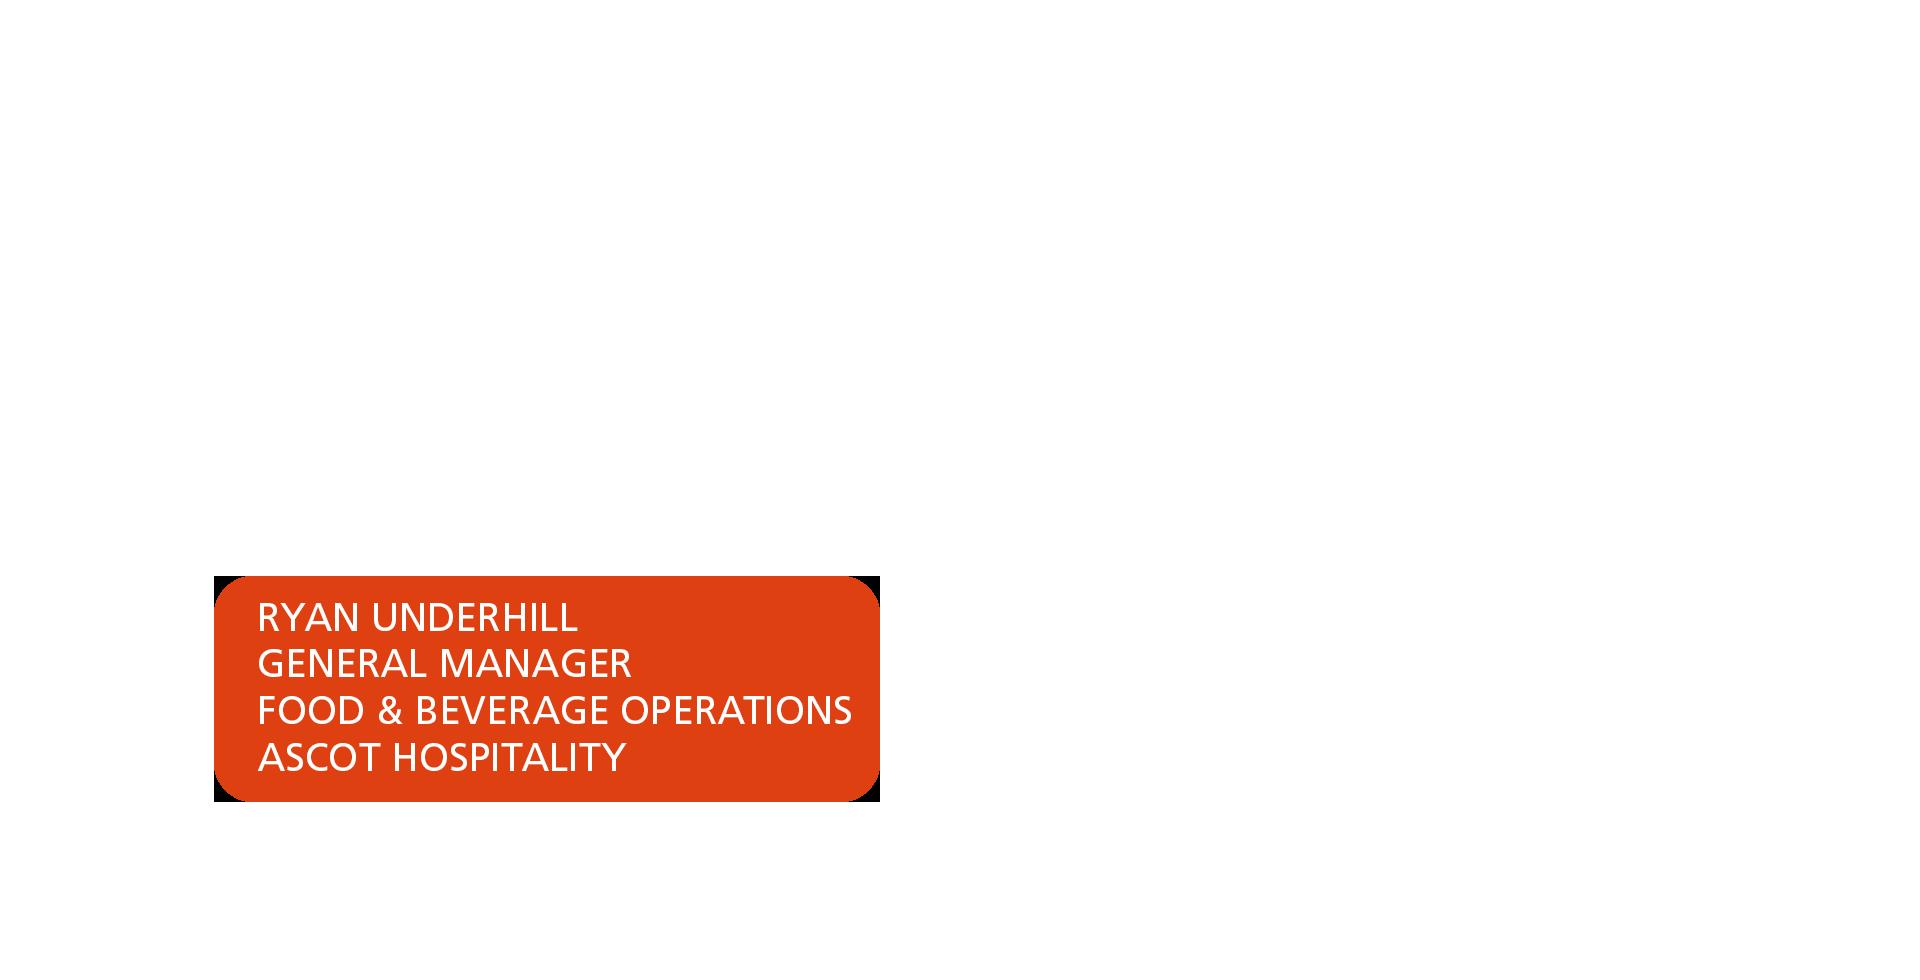 Orange box with text saying